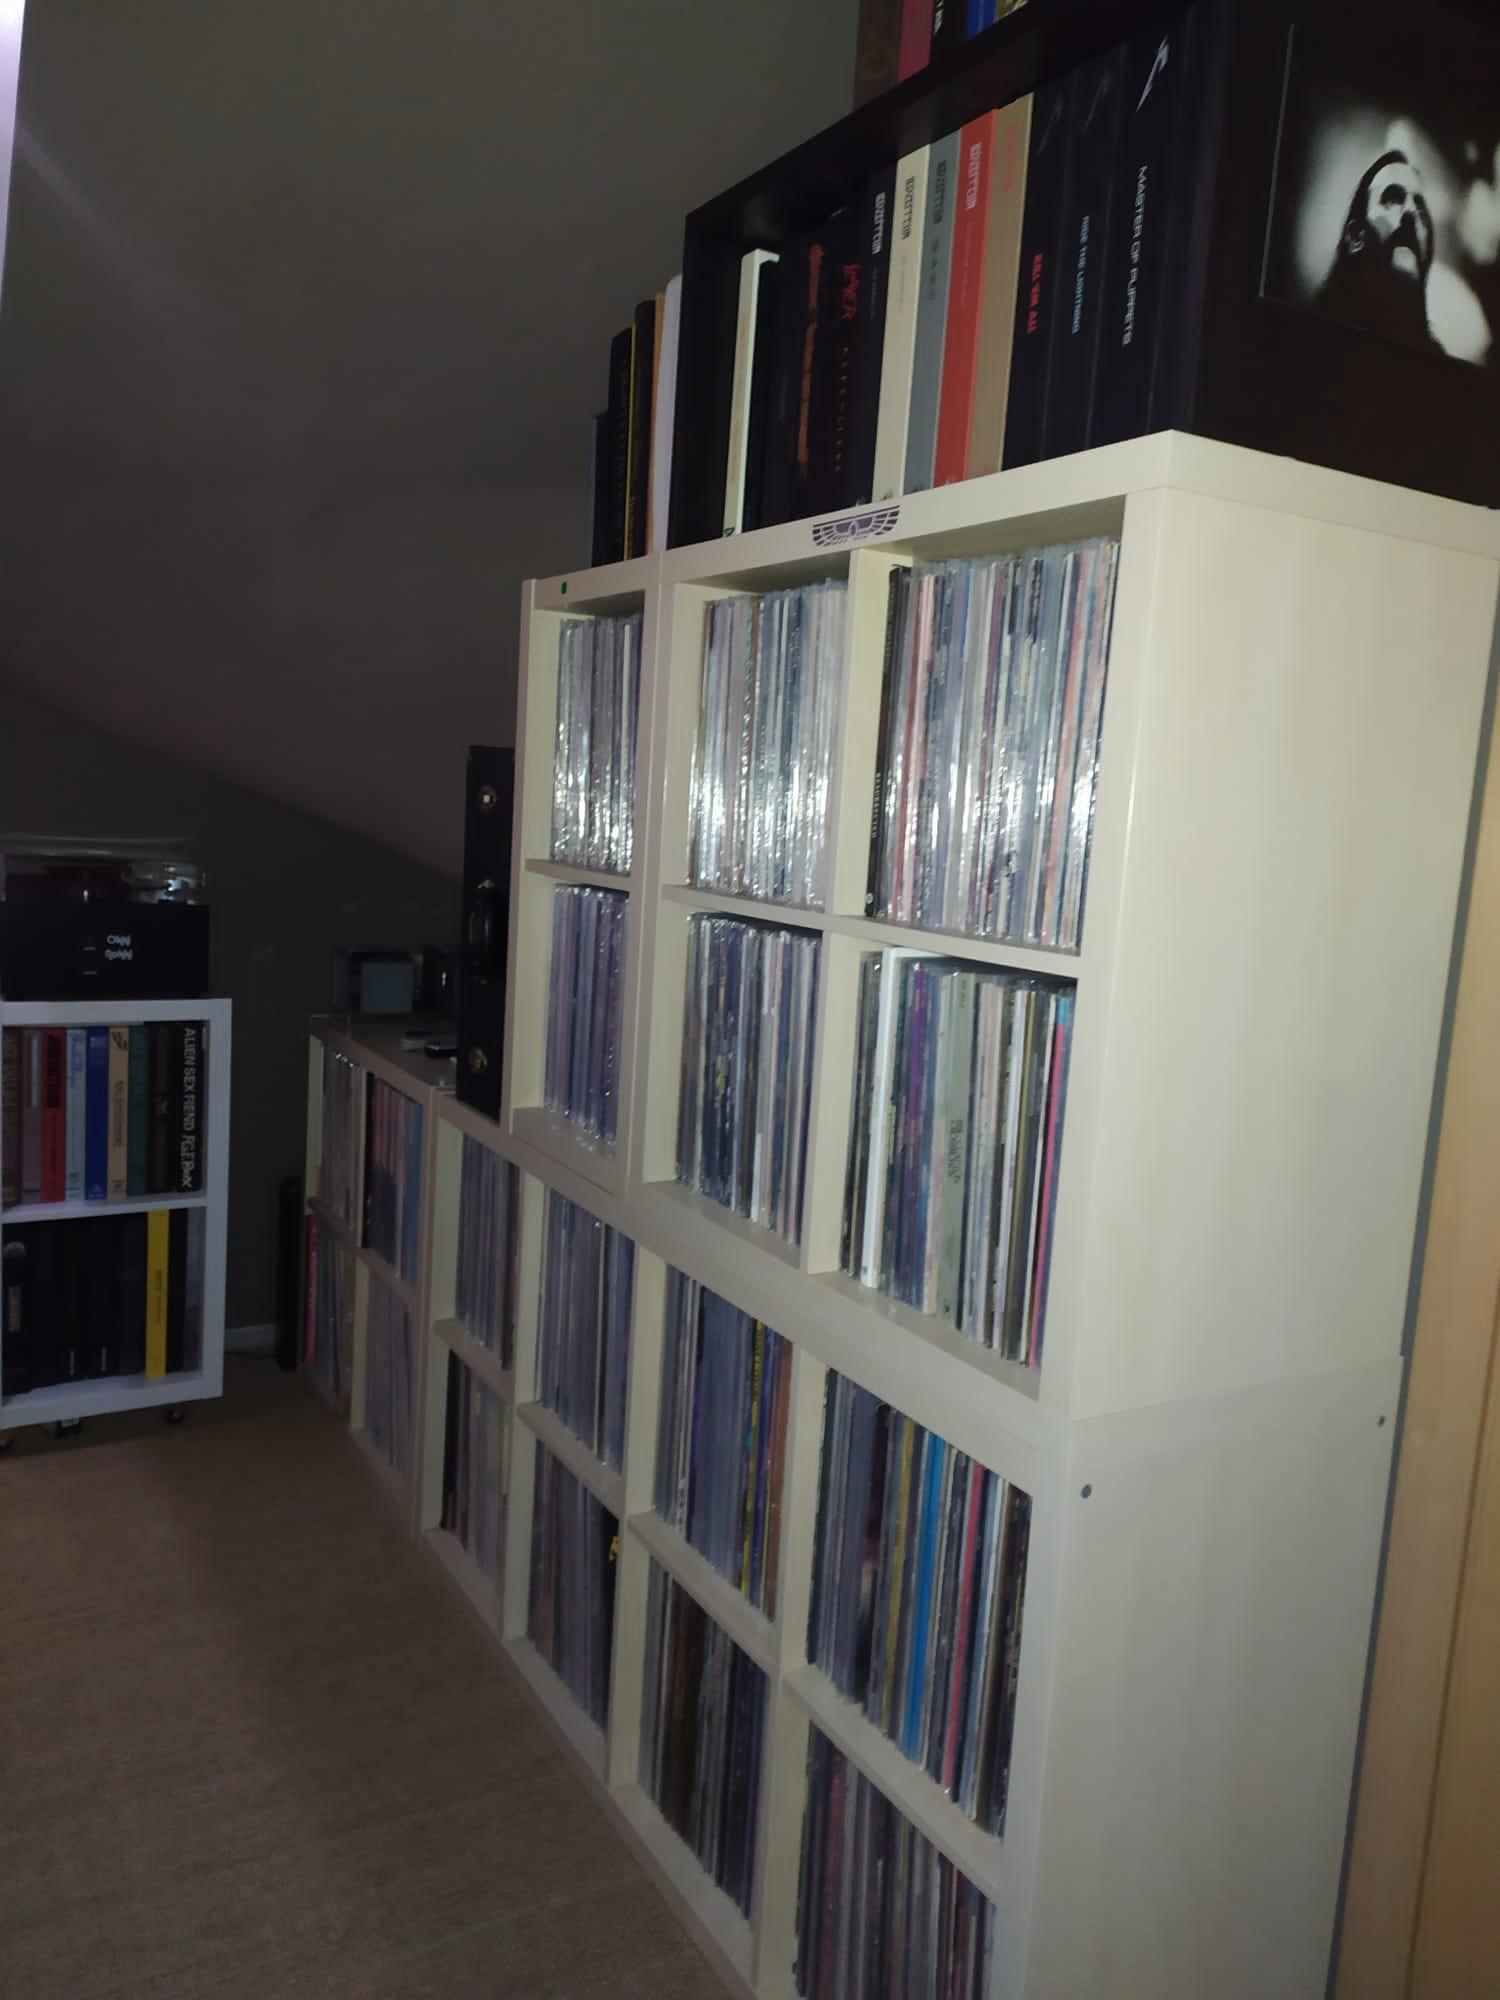 Salas audiofilas - Página 2 Img_2046